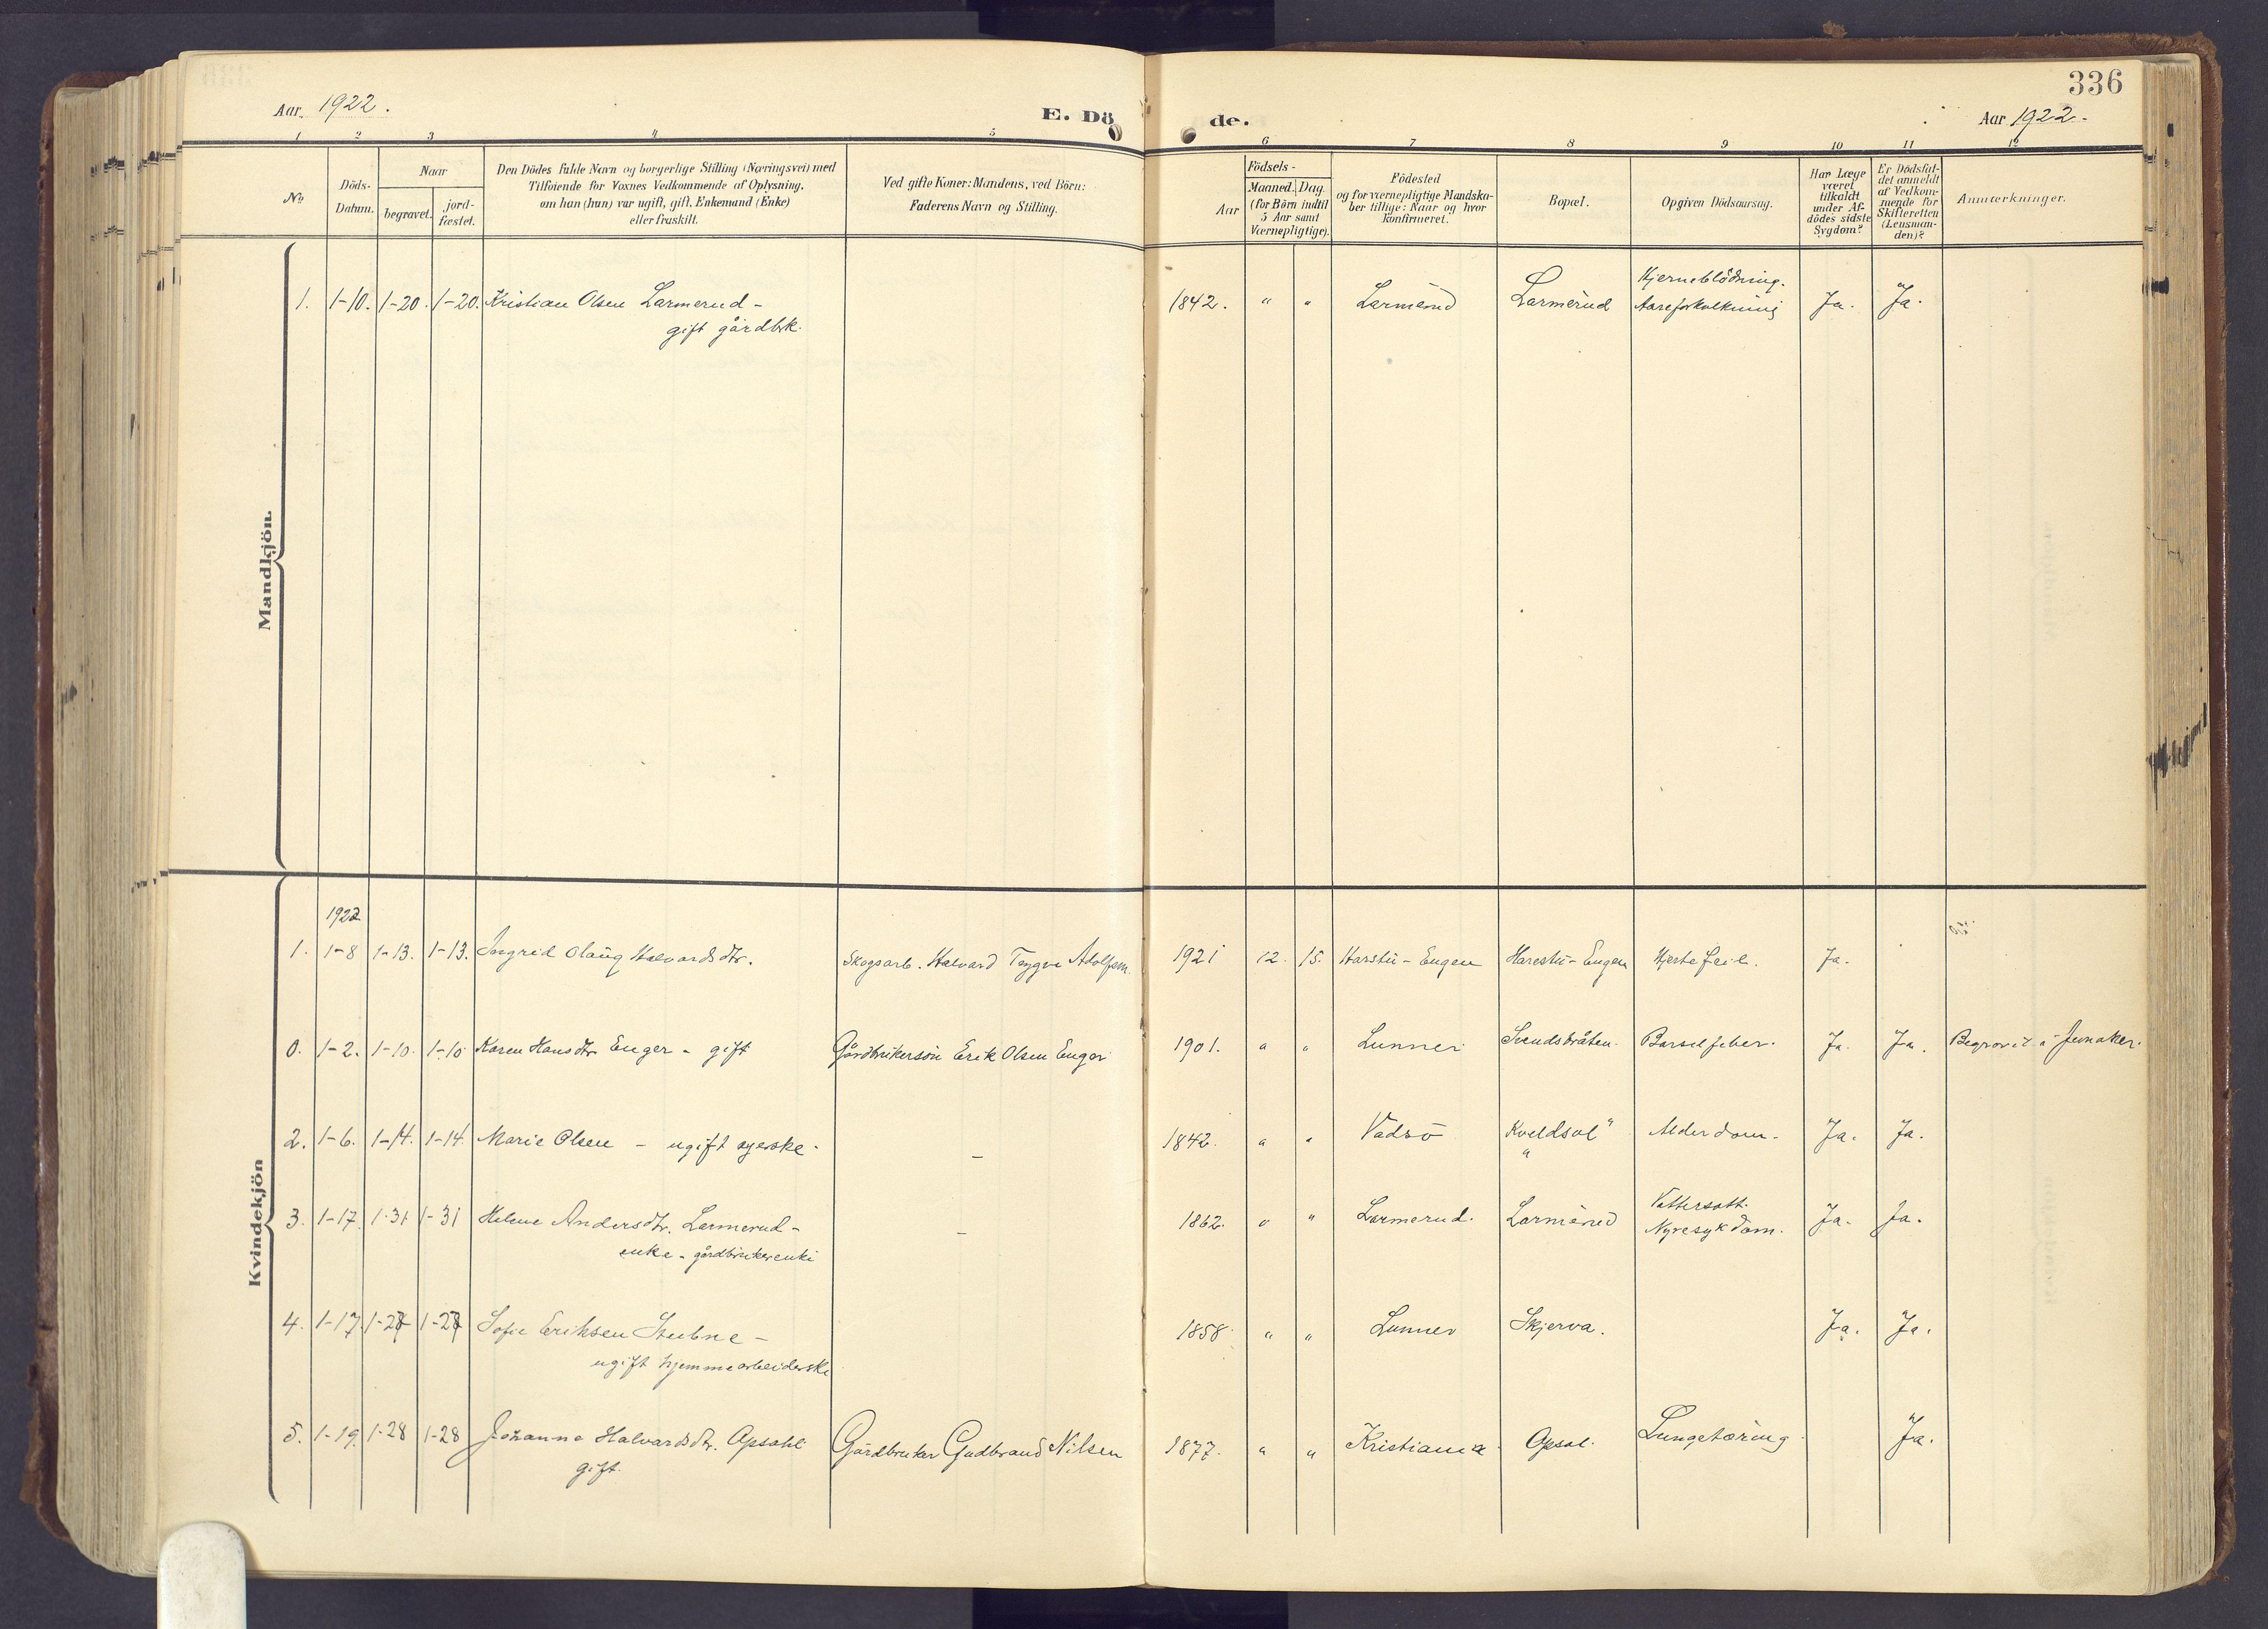 SAH, Lunner prestekontor, H/Ha/Haa/L0001: Ministerialbok nr. 1, 1907-1922, s. 336